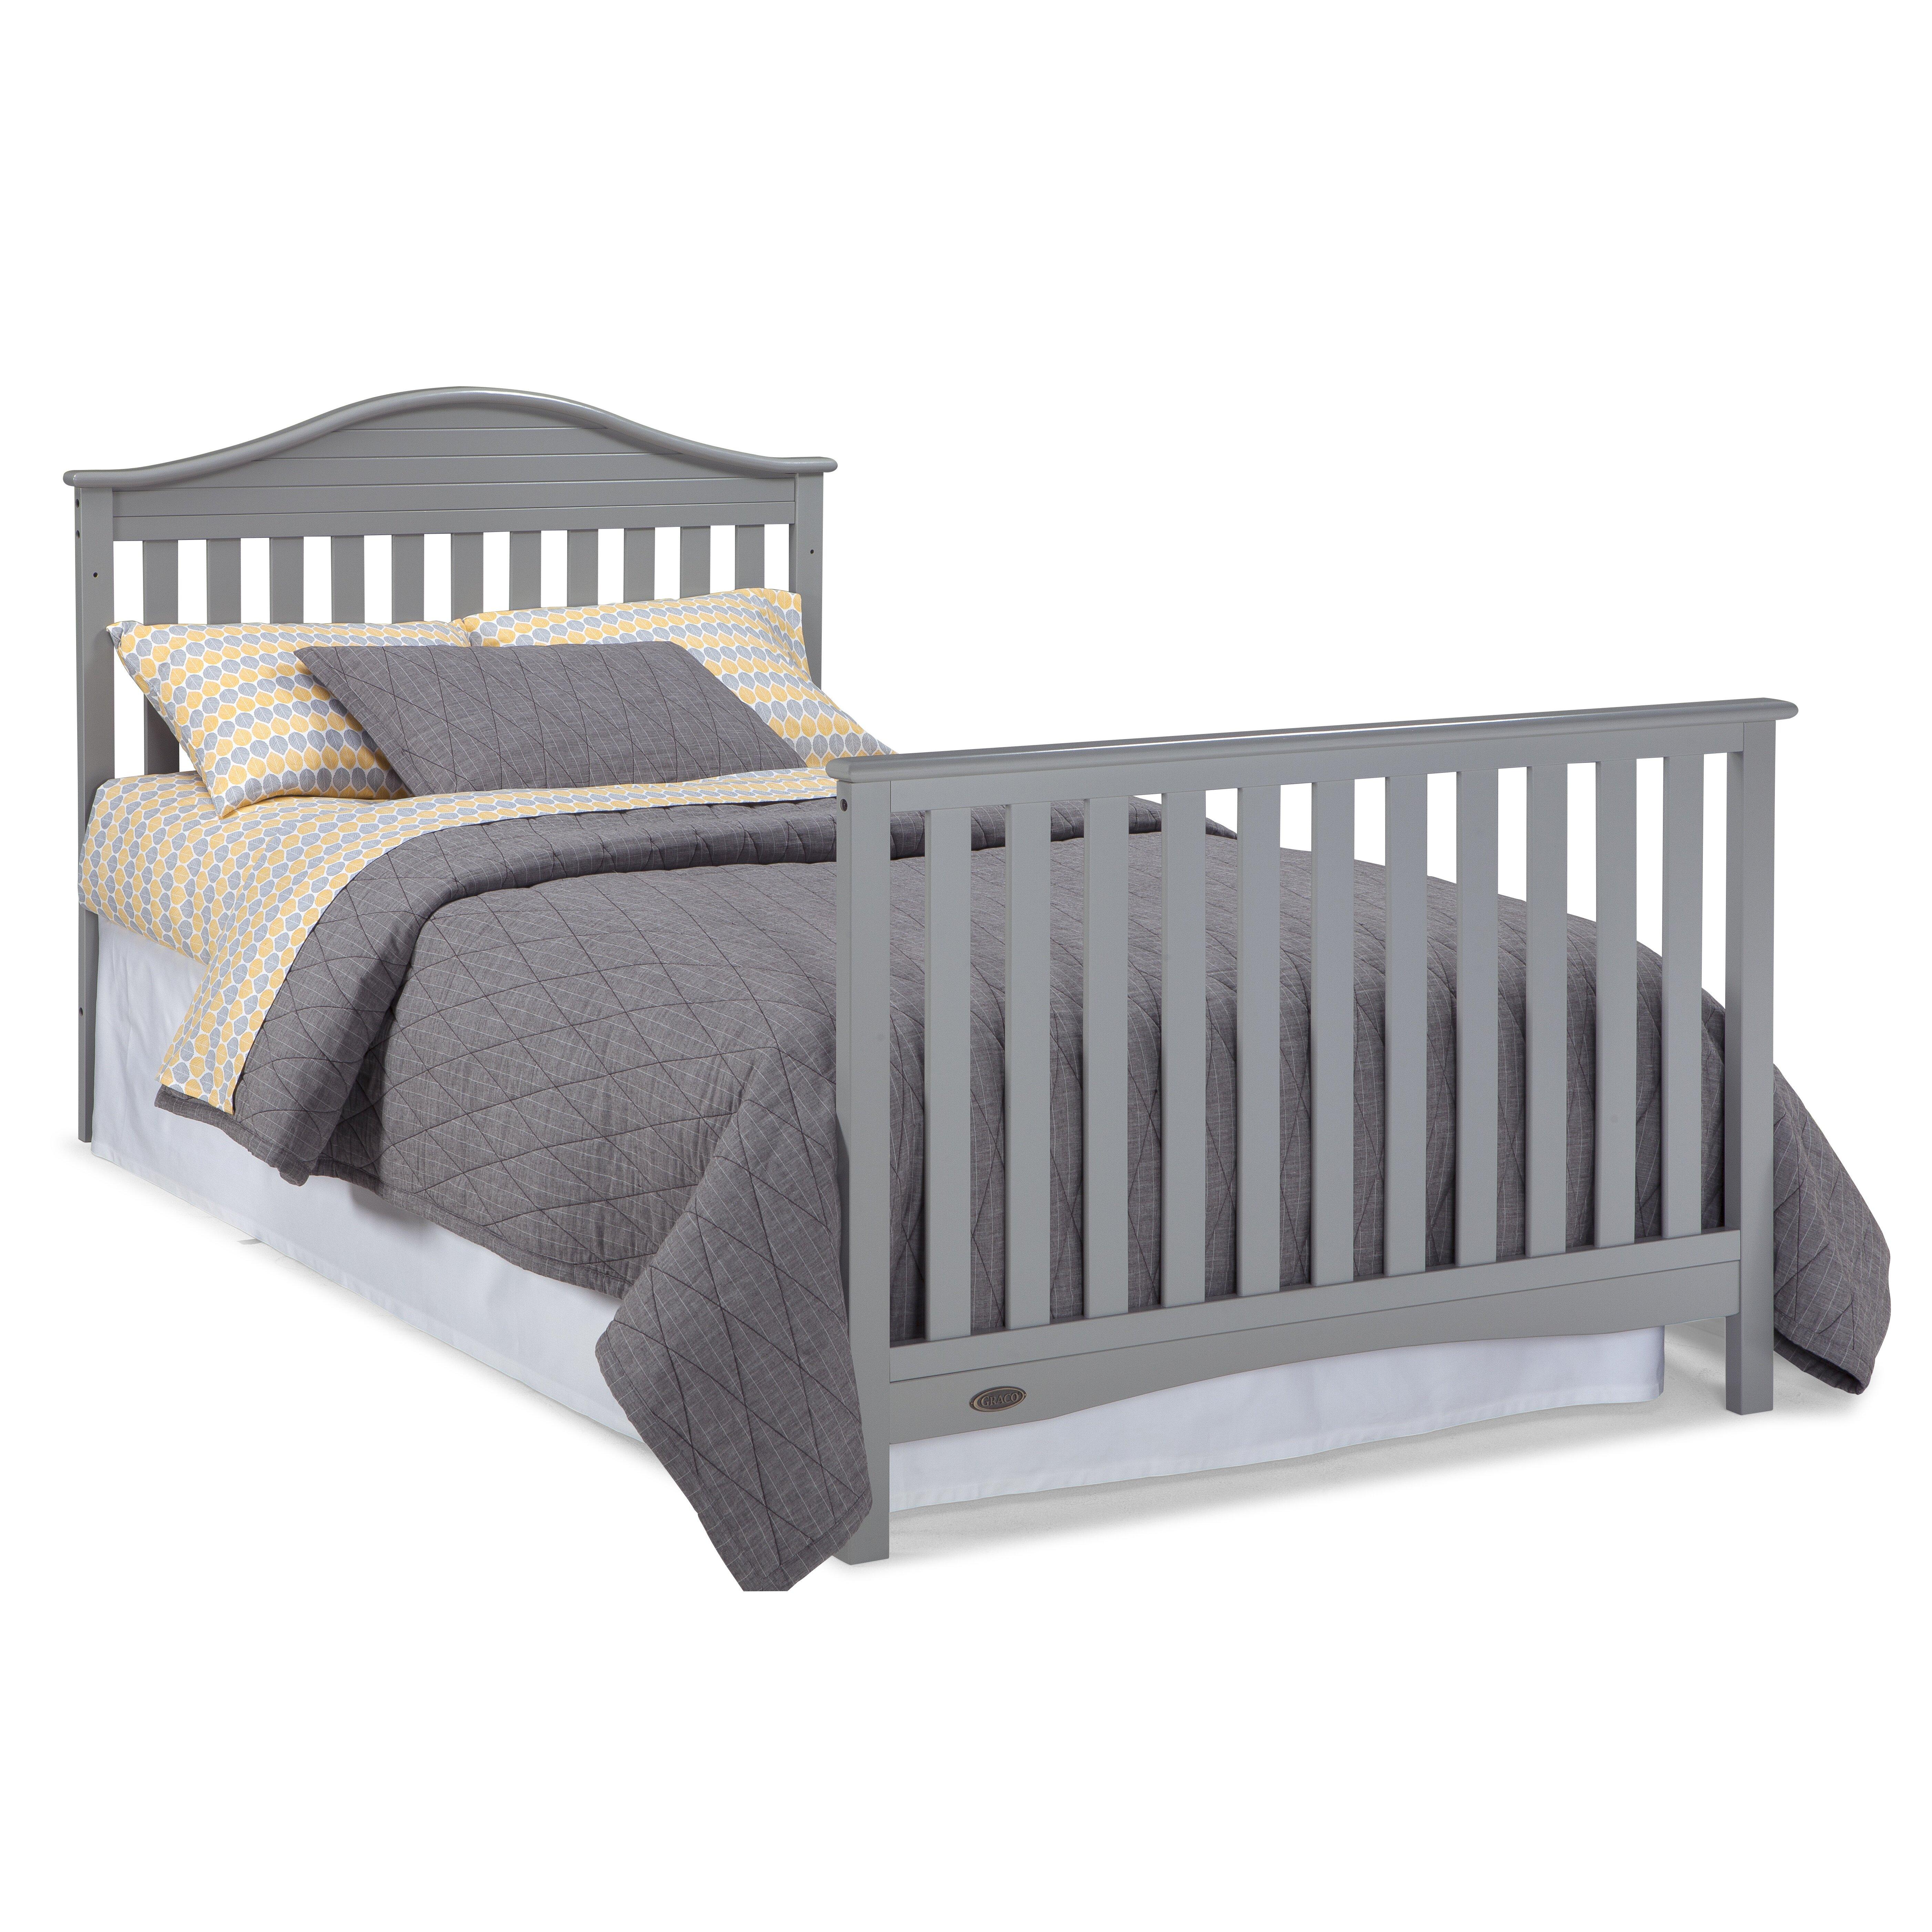 Graco crib for sale manila - Baby Cribs Graco Graco Harbor Lights 4 In 1 Convertible Crib